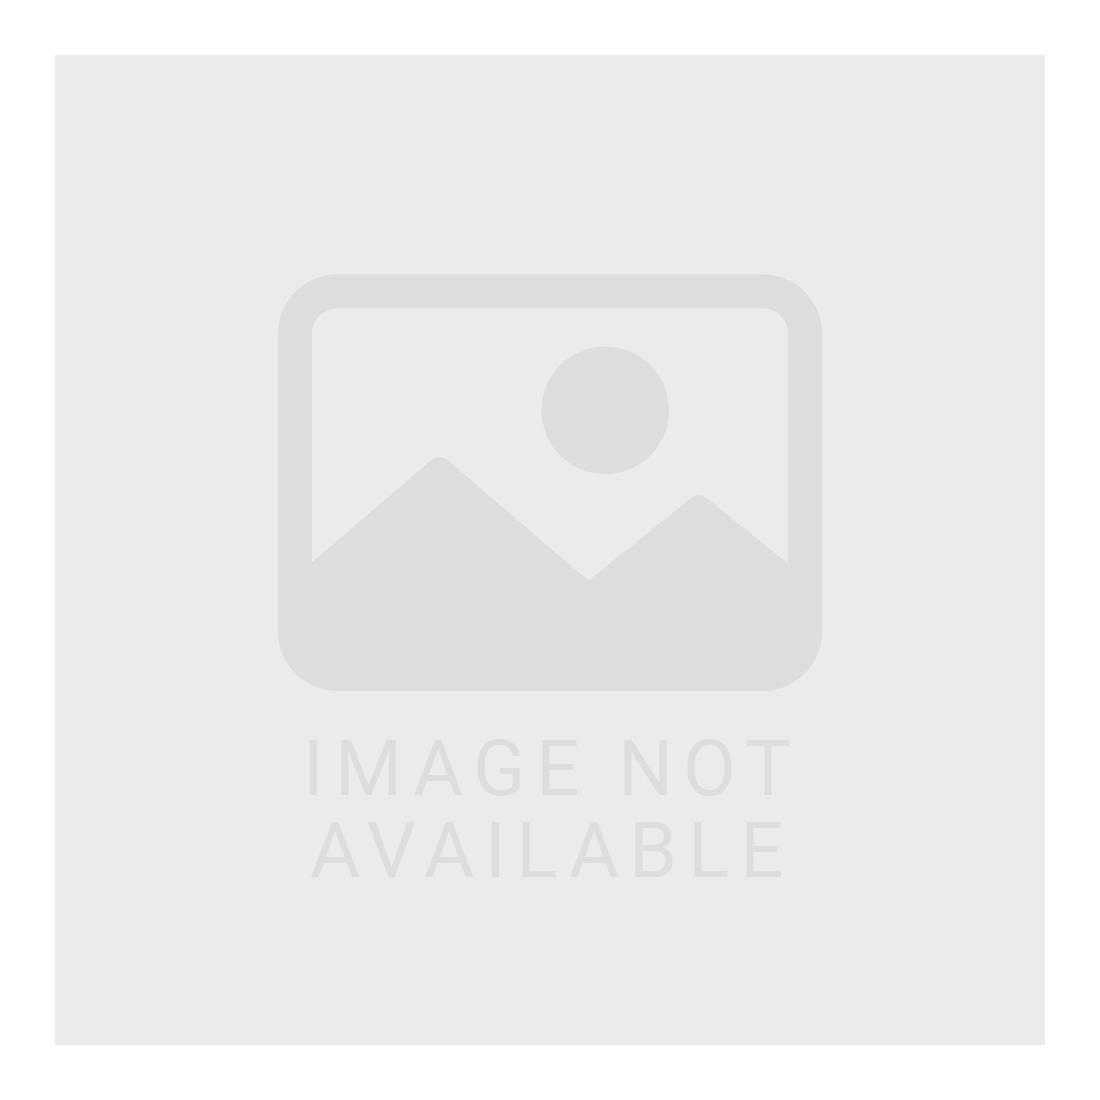 22 oz Copper Vacuum Insulated Bottle